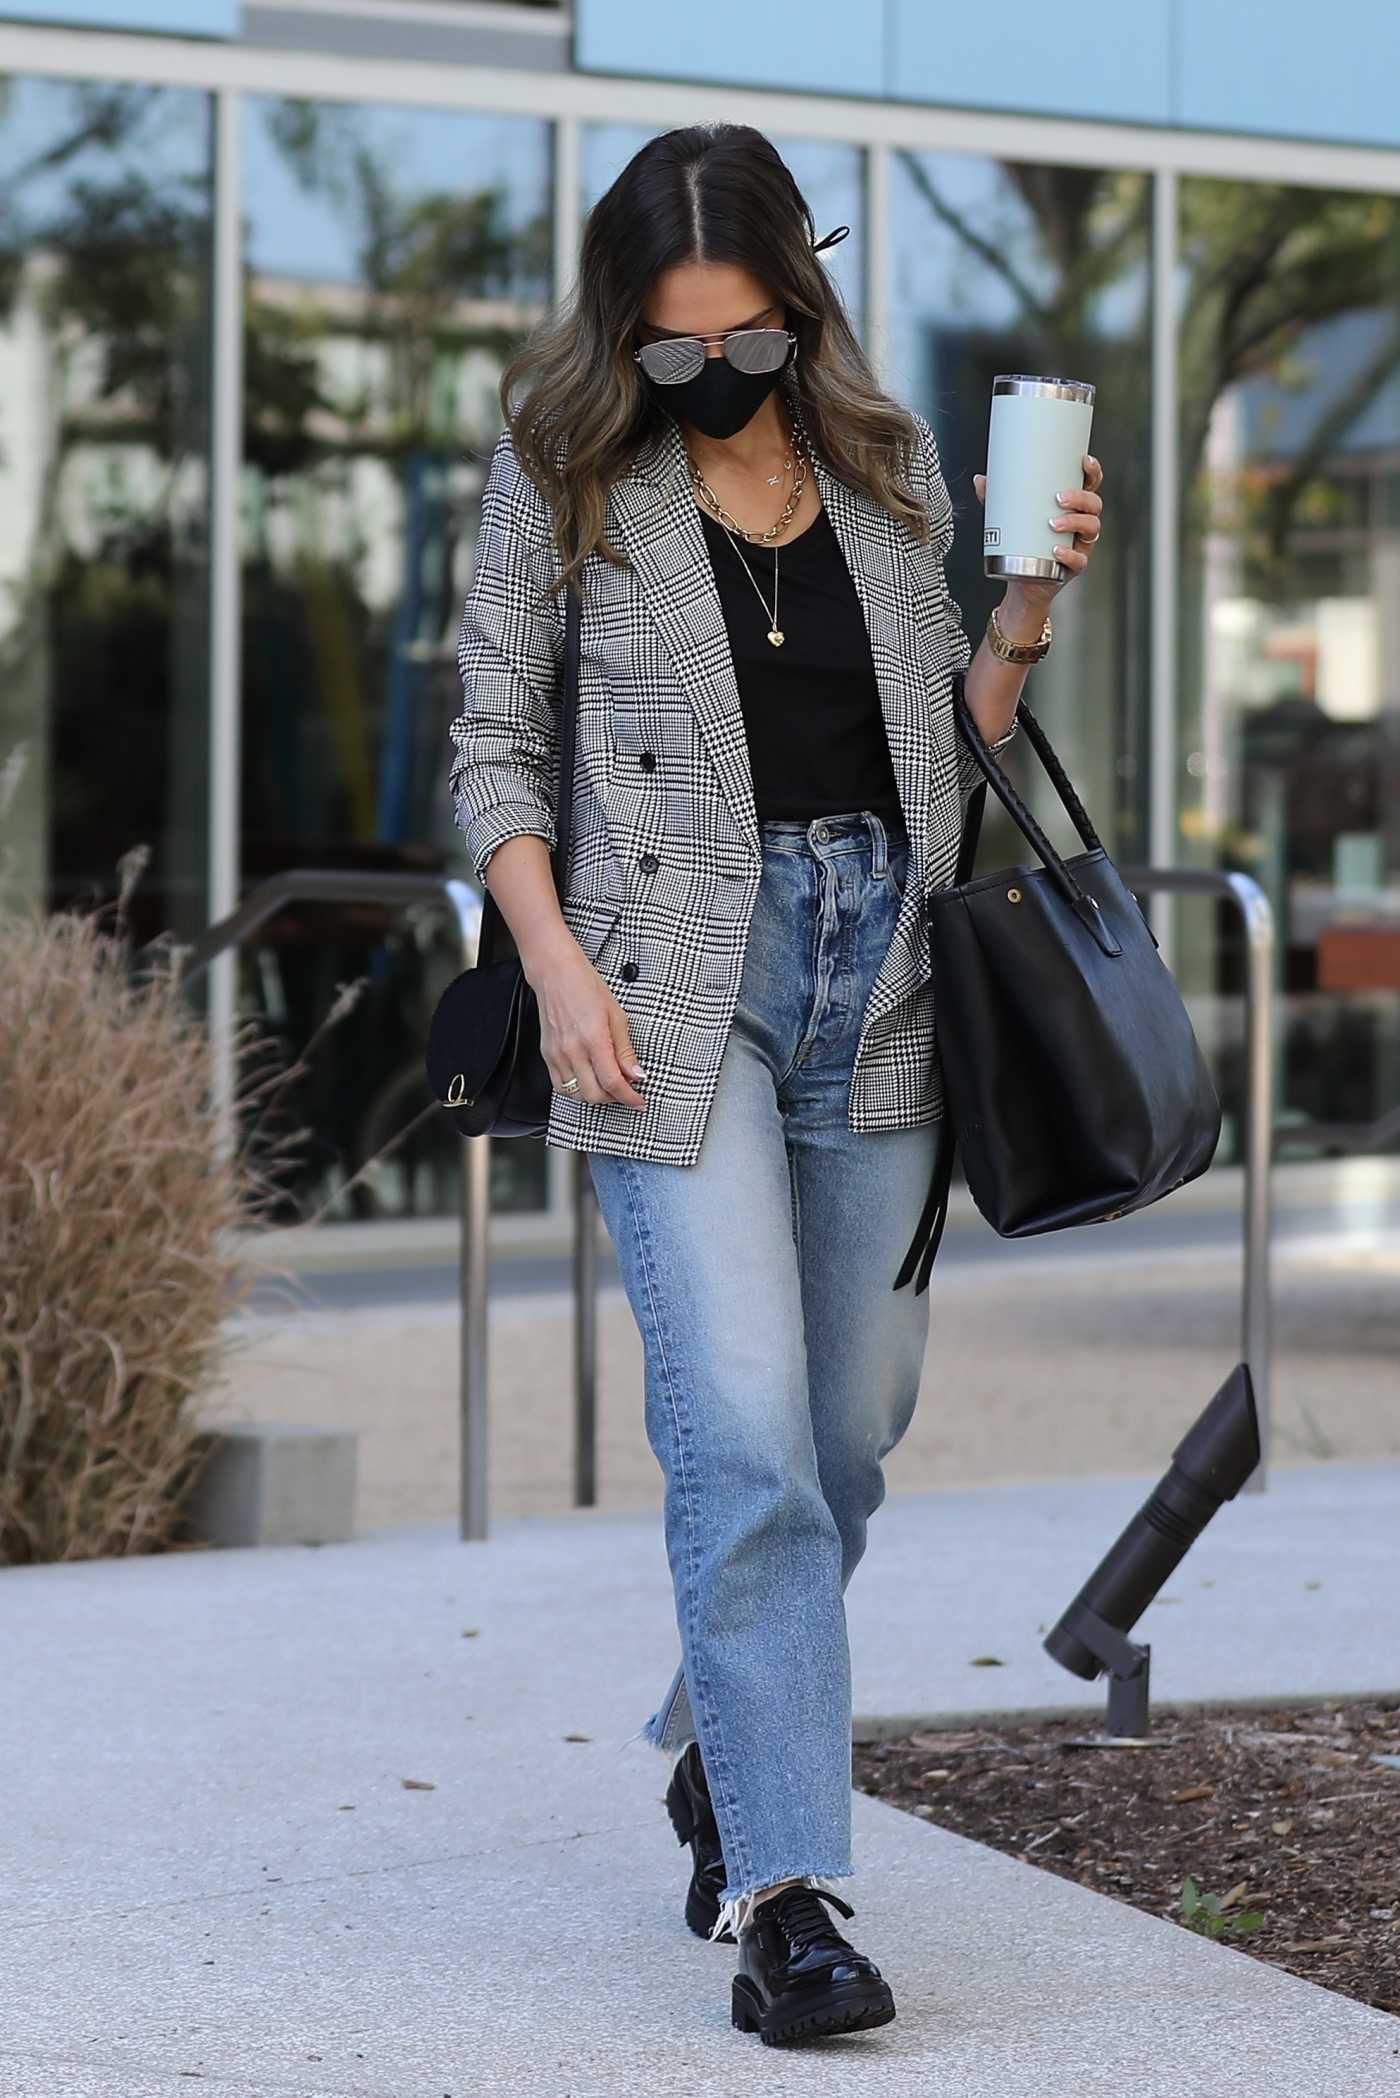 Jessica Alba in a Grey Blazer Arrives at the Honest Headquarters in Playa Vista 03/02/2021